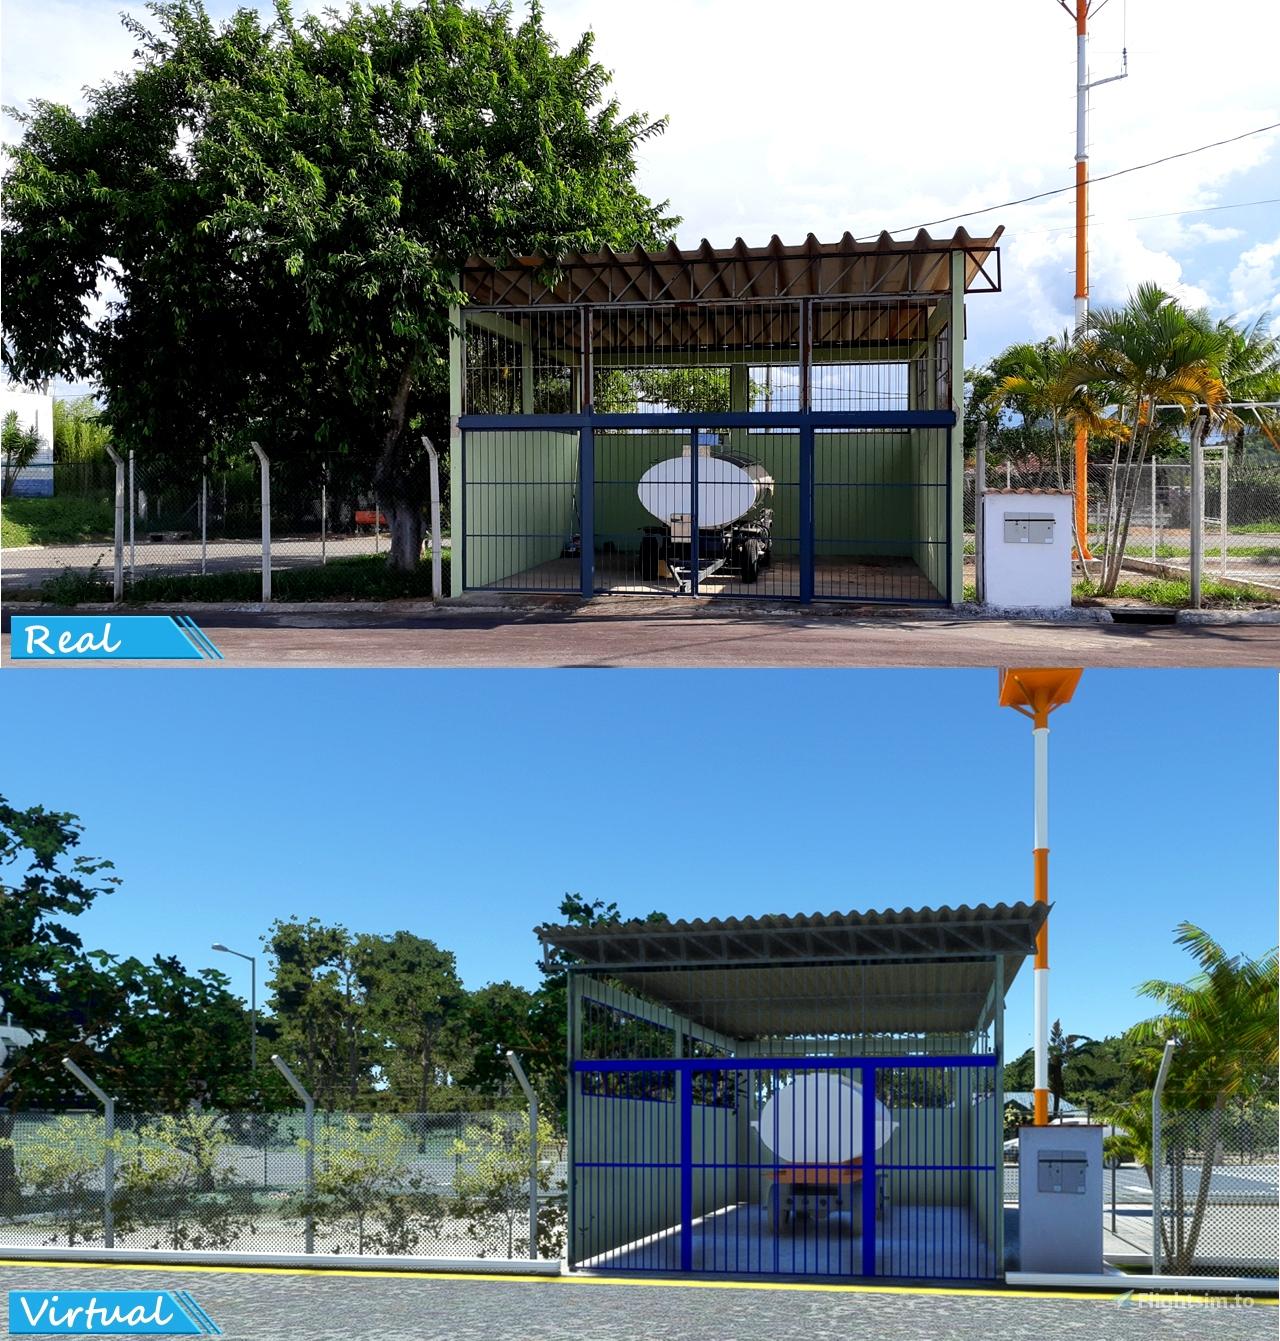 SNTO - Aeroporto Juscelino Kubitschek - Teófilo Otoni - Minas Gerais